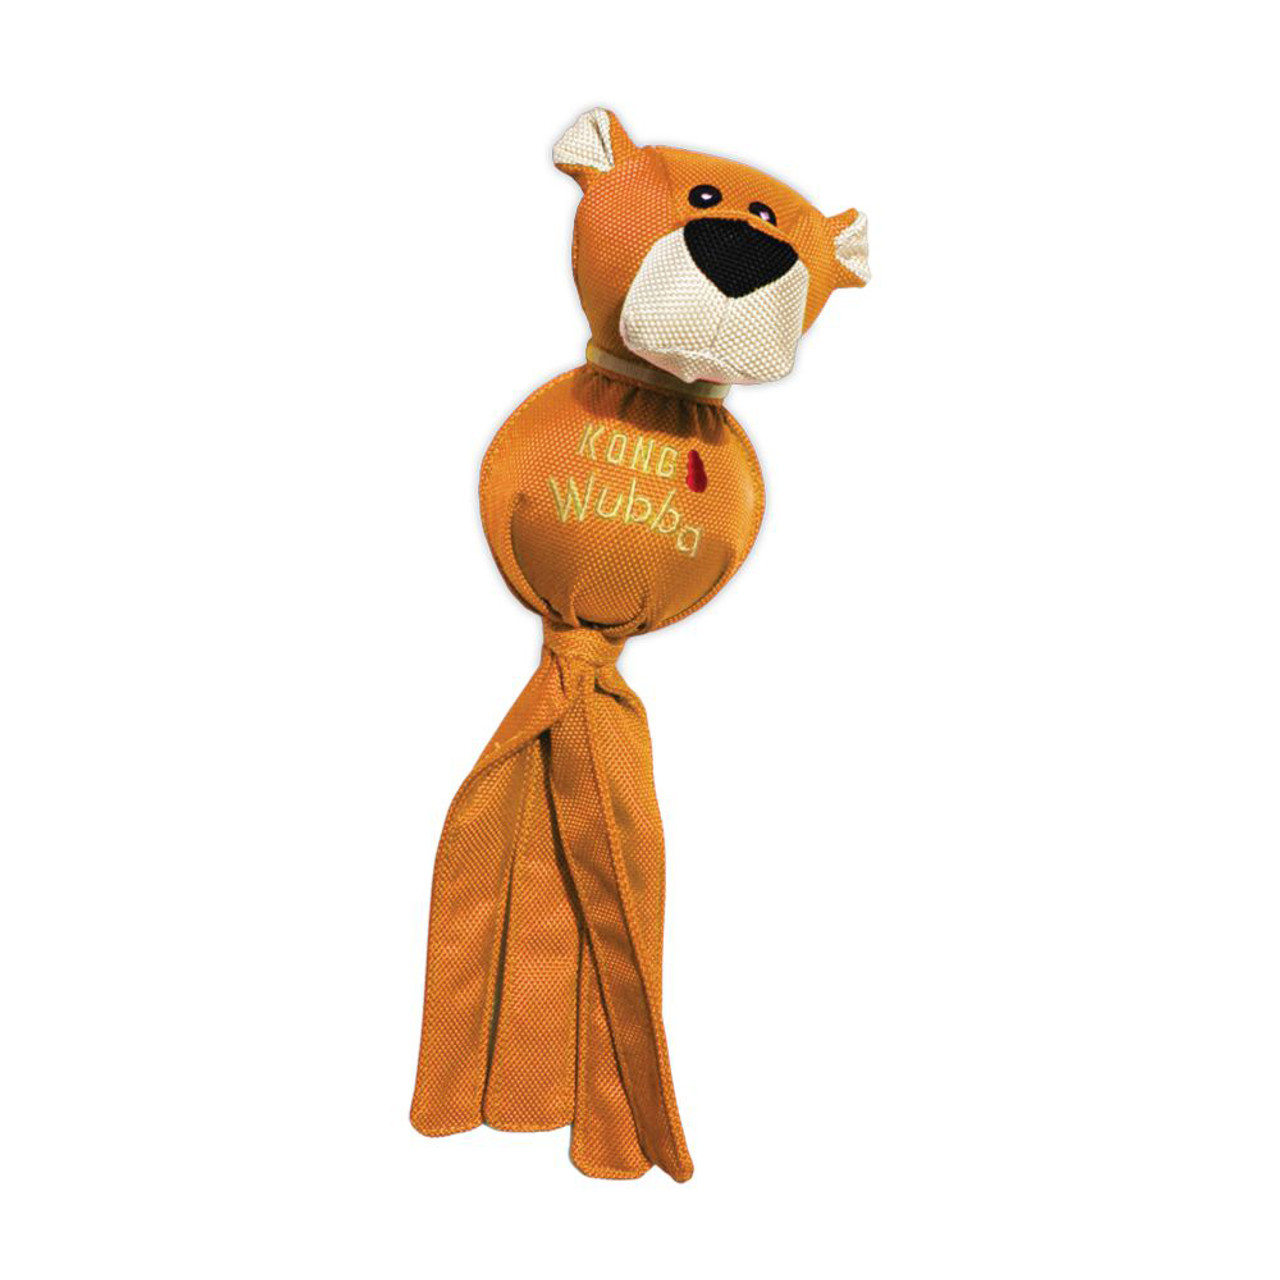 Kong Wubba Ballistic Friends Dog Toy, Assorted - Orange Lion